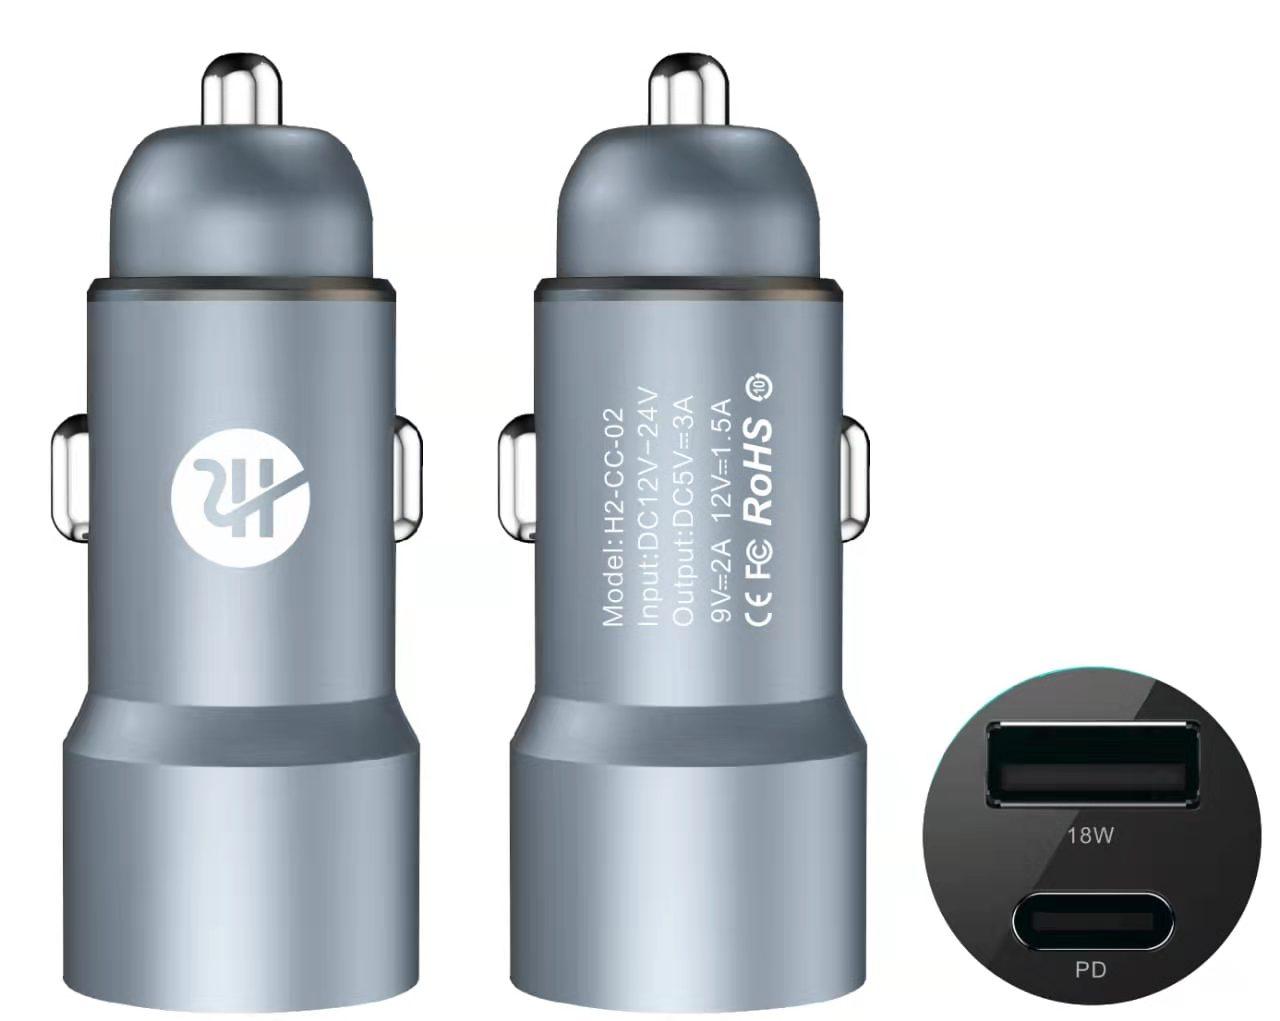 H2 gadgets Dual Car Charger PD+Qc3